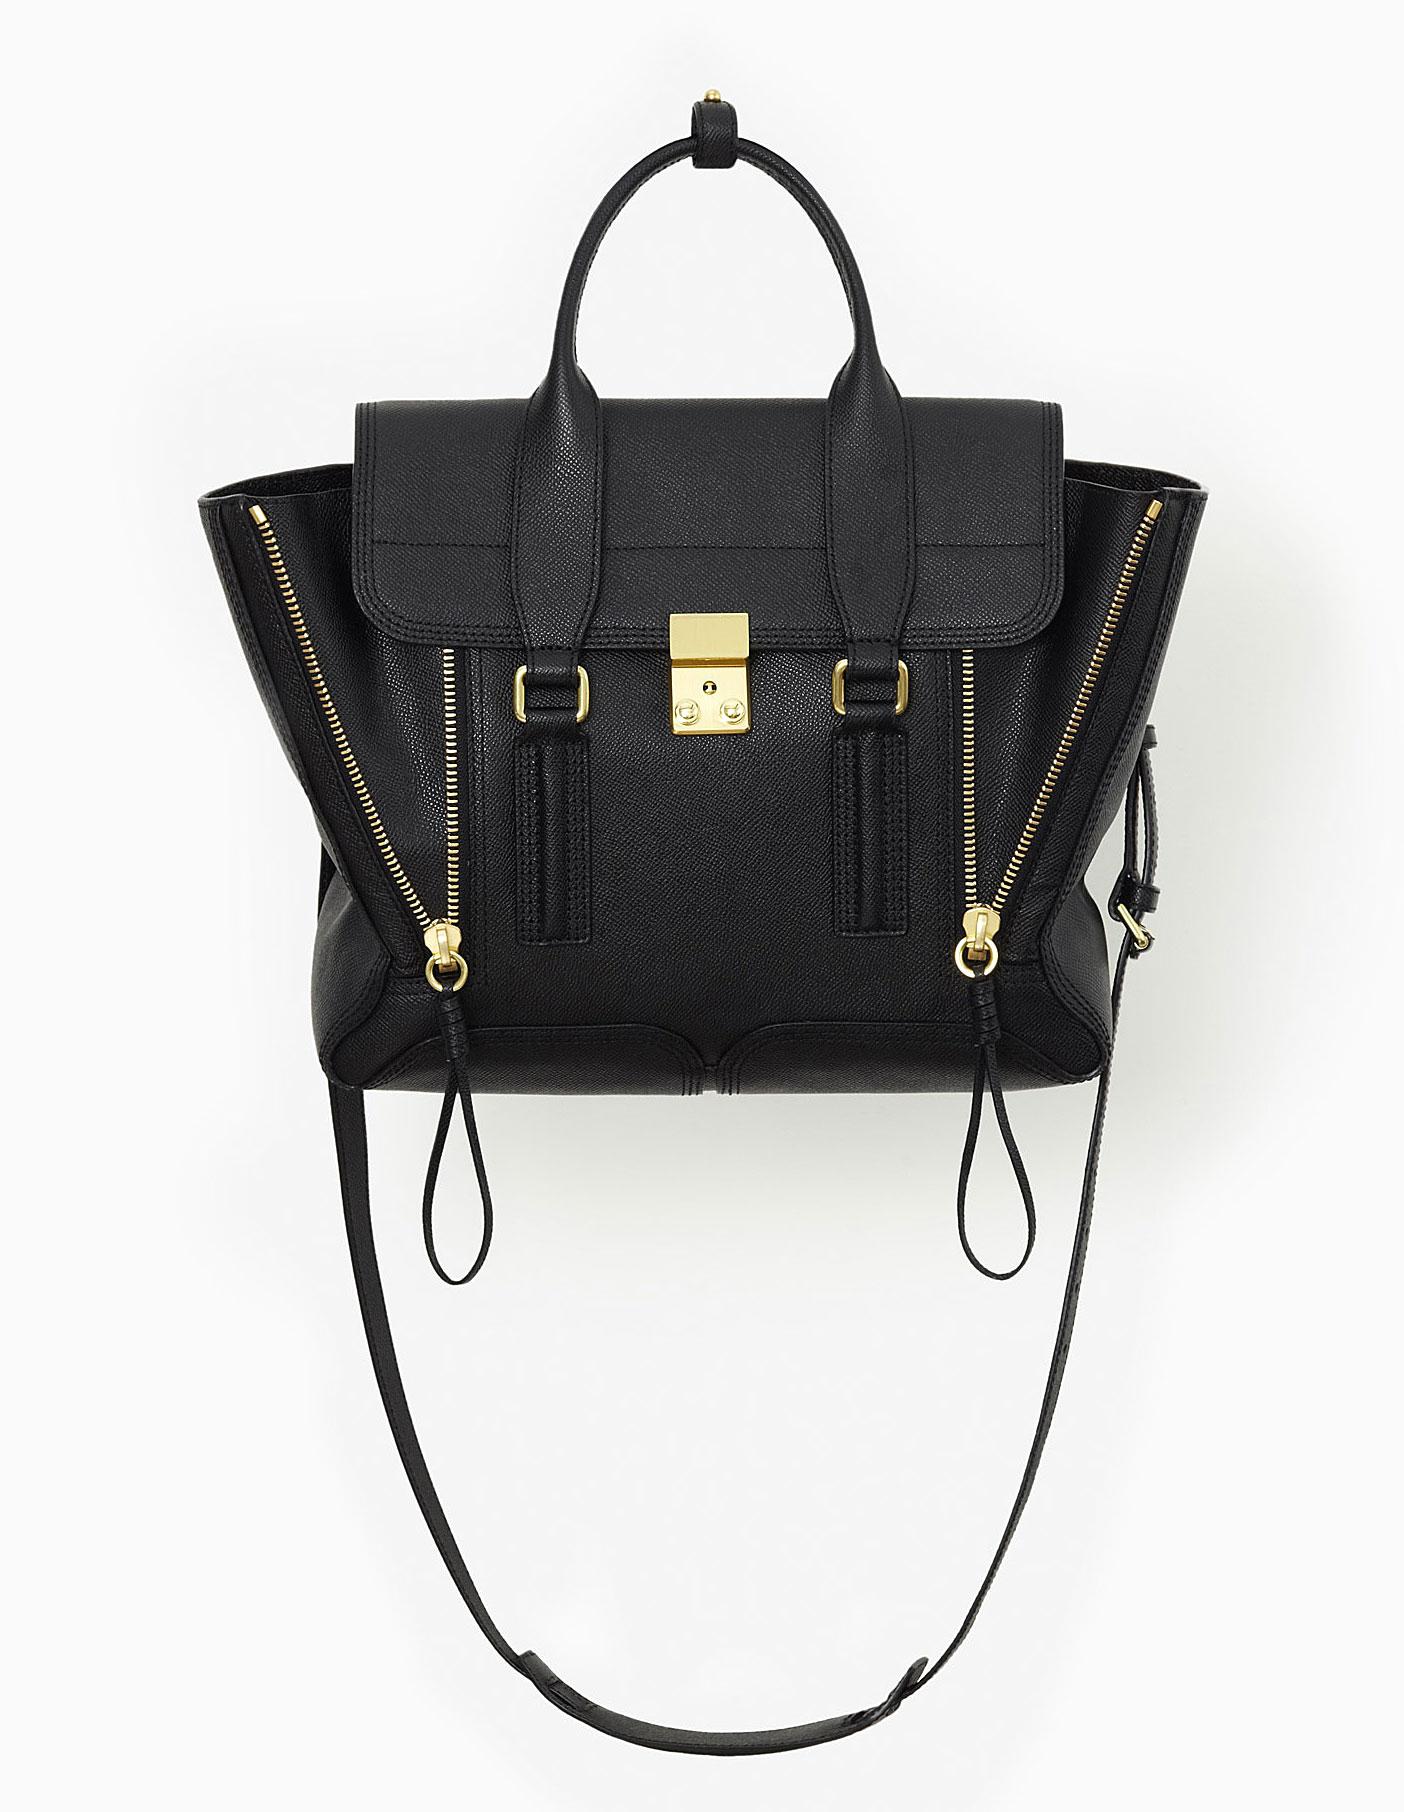 3.1 Phillip Lim Pashli Satchel Bag Black